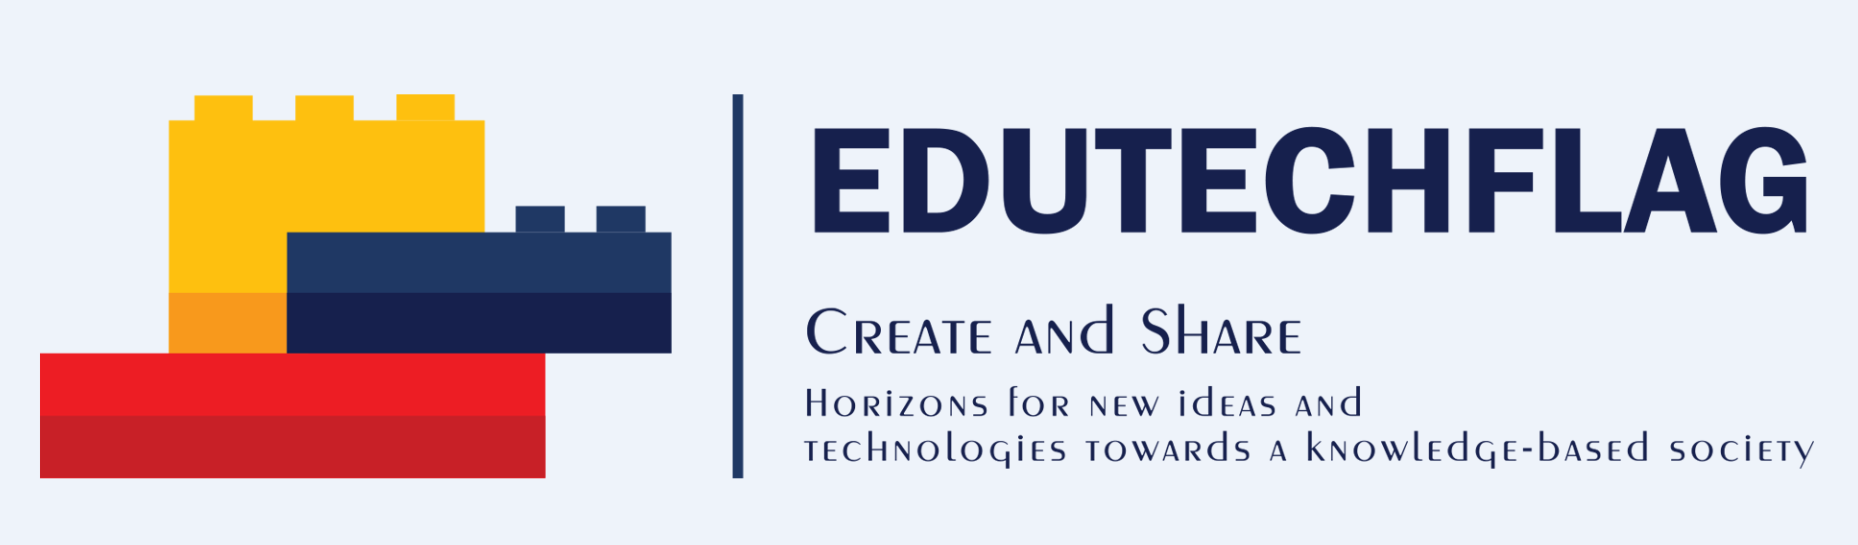 EduTechFlag Logo